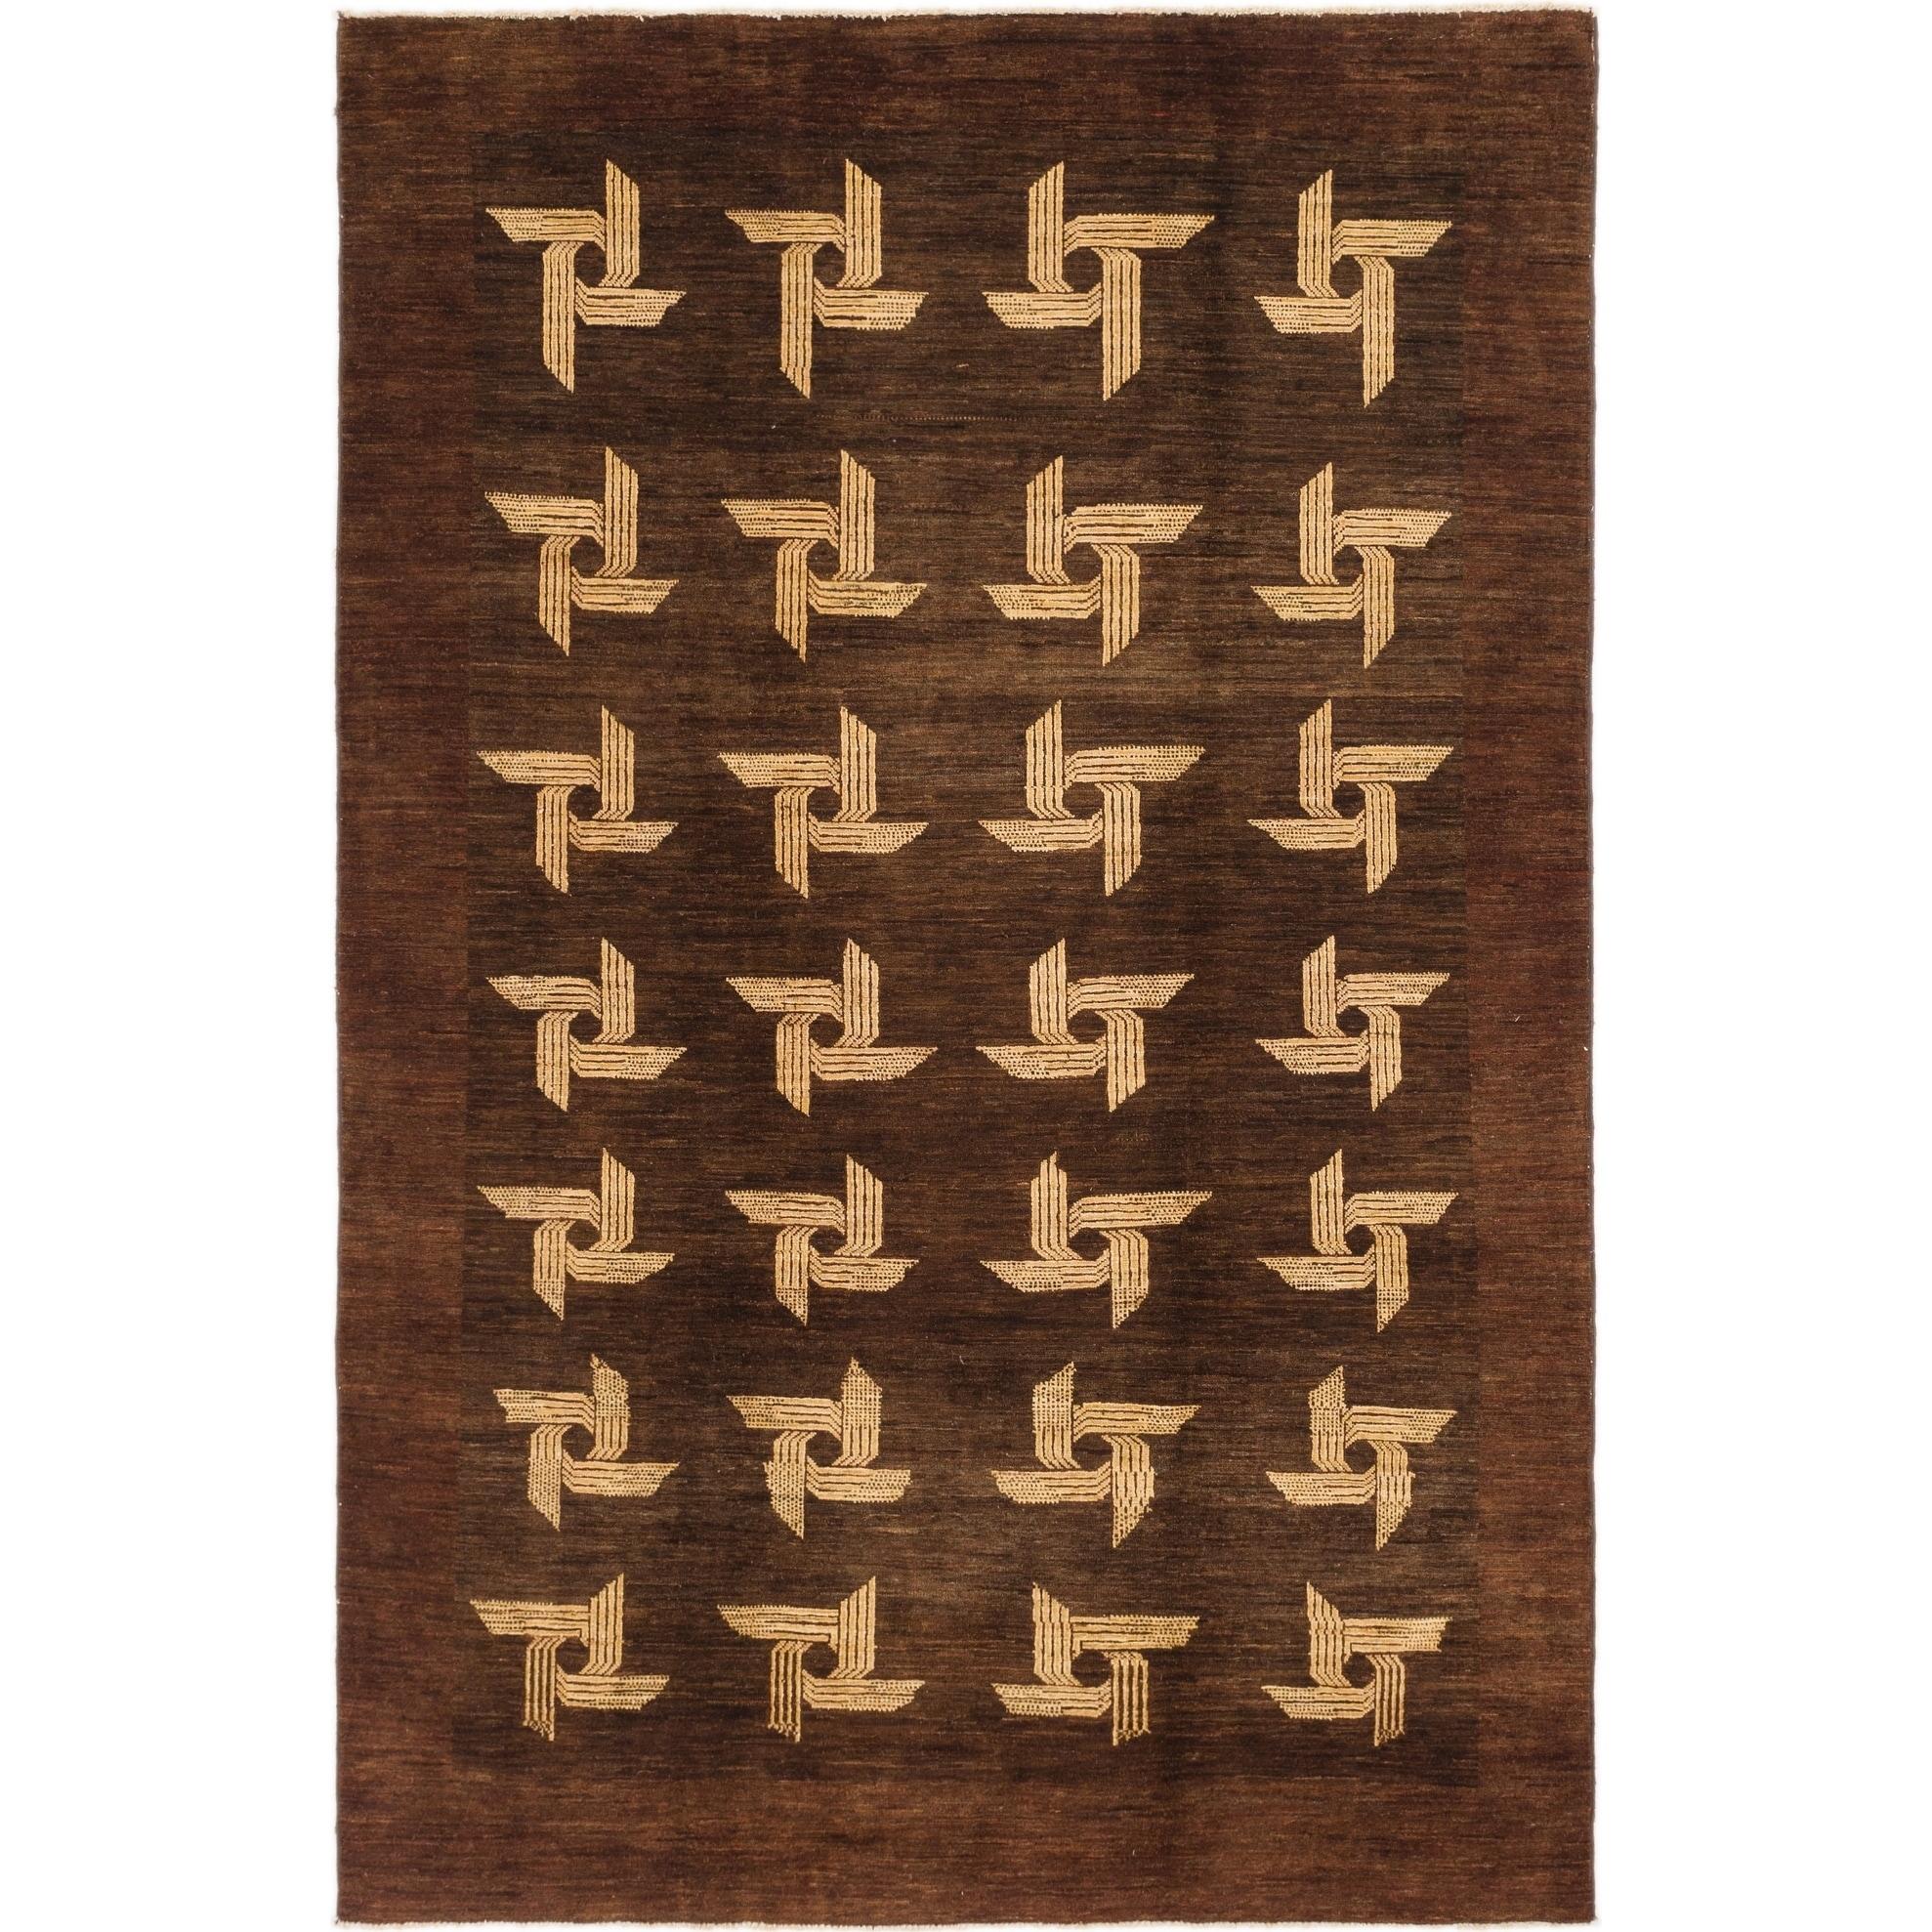 Hand Knotted Kashkuli Gabbeh Wool Area Rug - 6 x 8 10 (Maroon - 6 x 8 10)